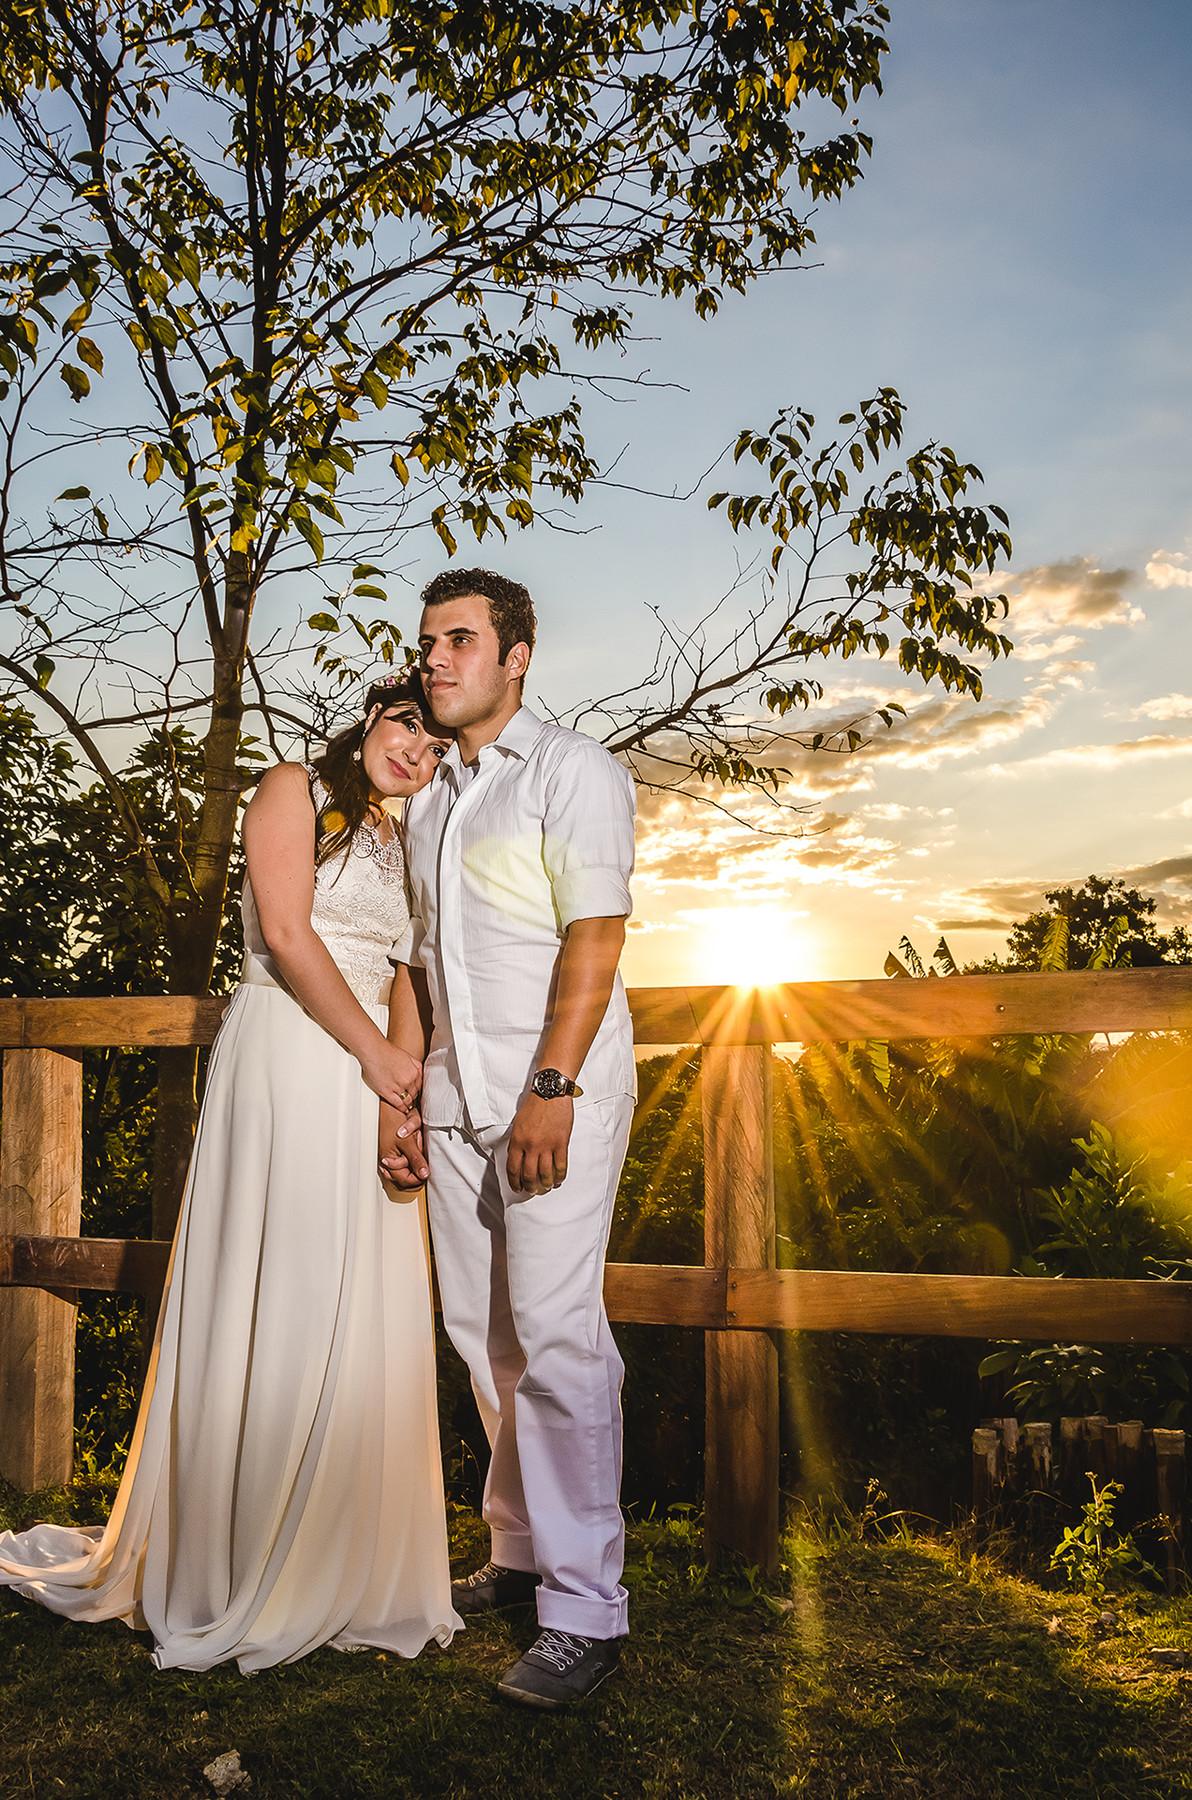 Muitas vezes Ensaios - Damaris e Willian - Pré Wedding - Nazaré Paulista - SP AX26